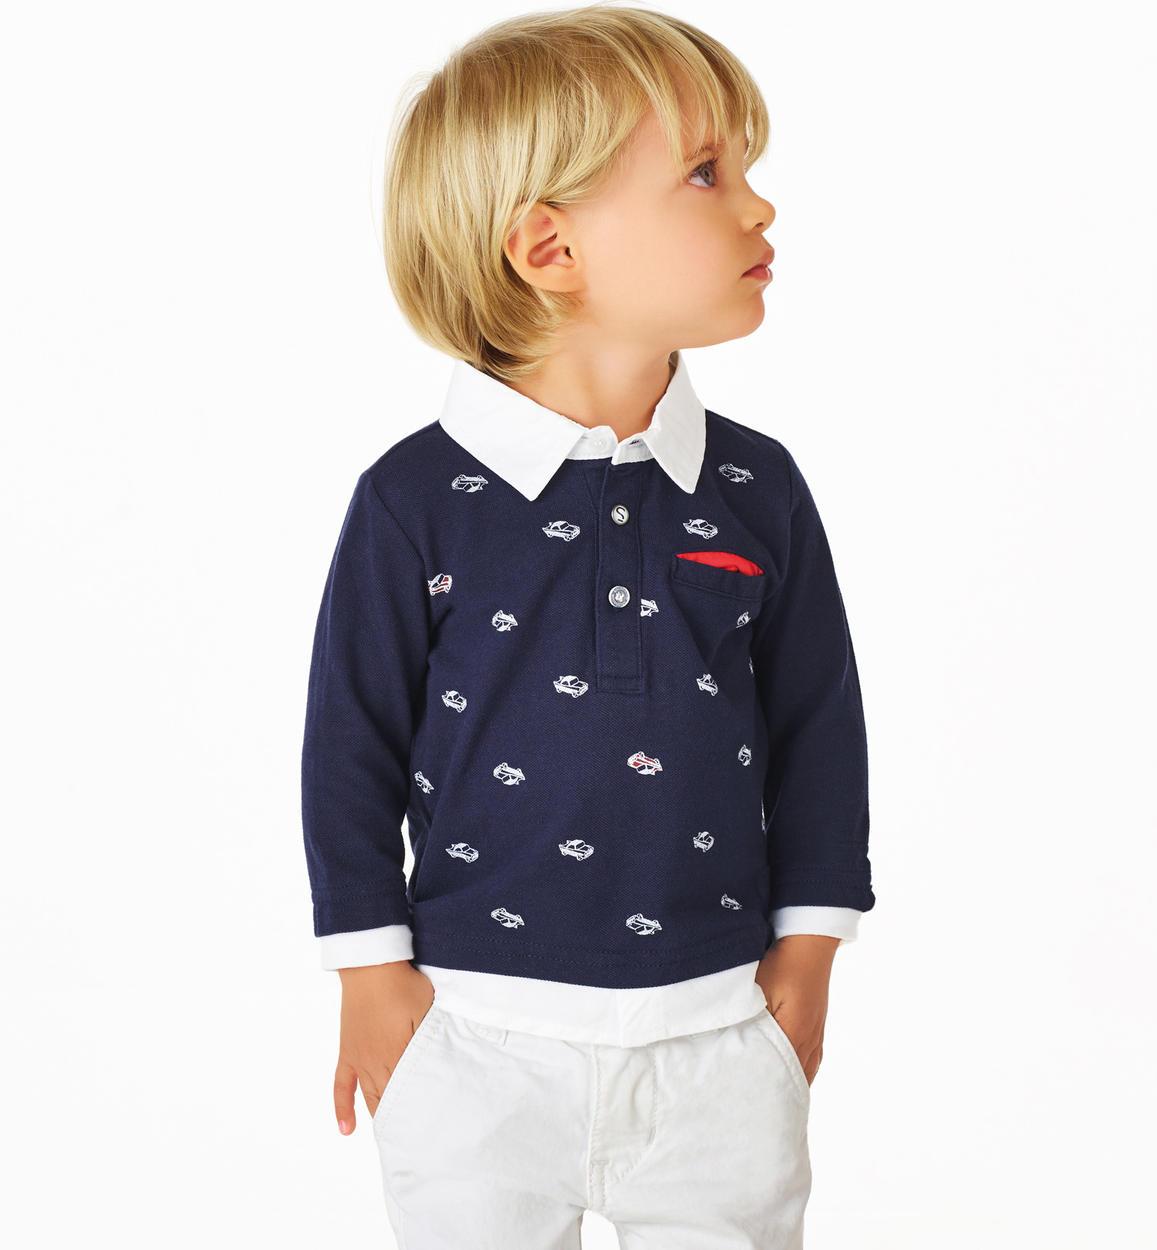 9e289b081a12 Polo in piquet 100% cotone con inserto finta camicia per bambino da 6 mesi  a 7 anni Sarabanda